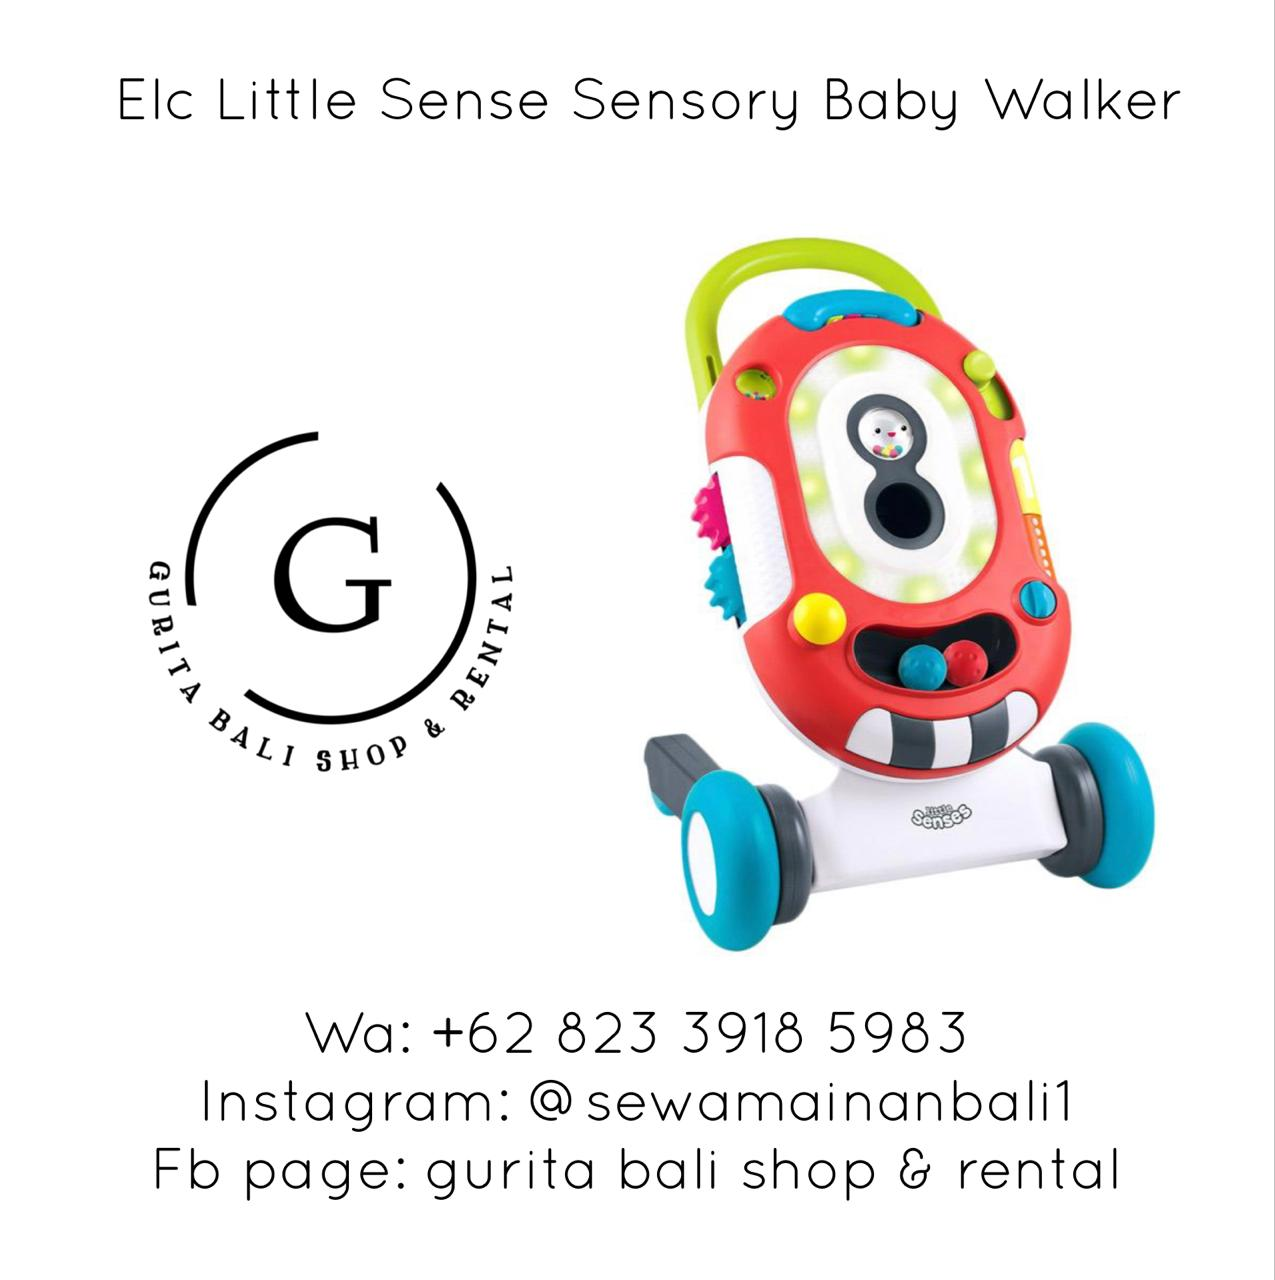 ELC LITTLE SENSE SENSORY BABY WALKER